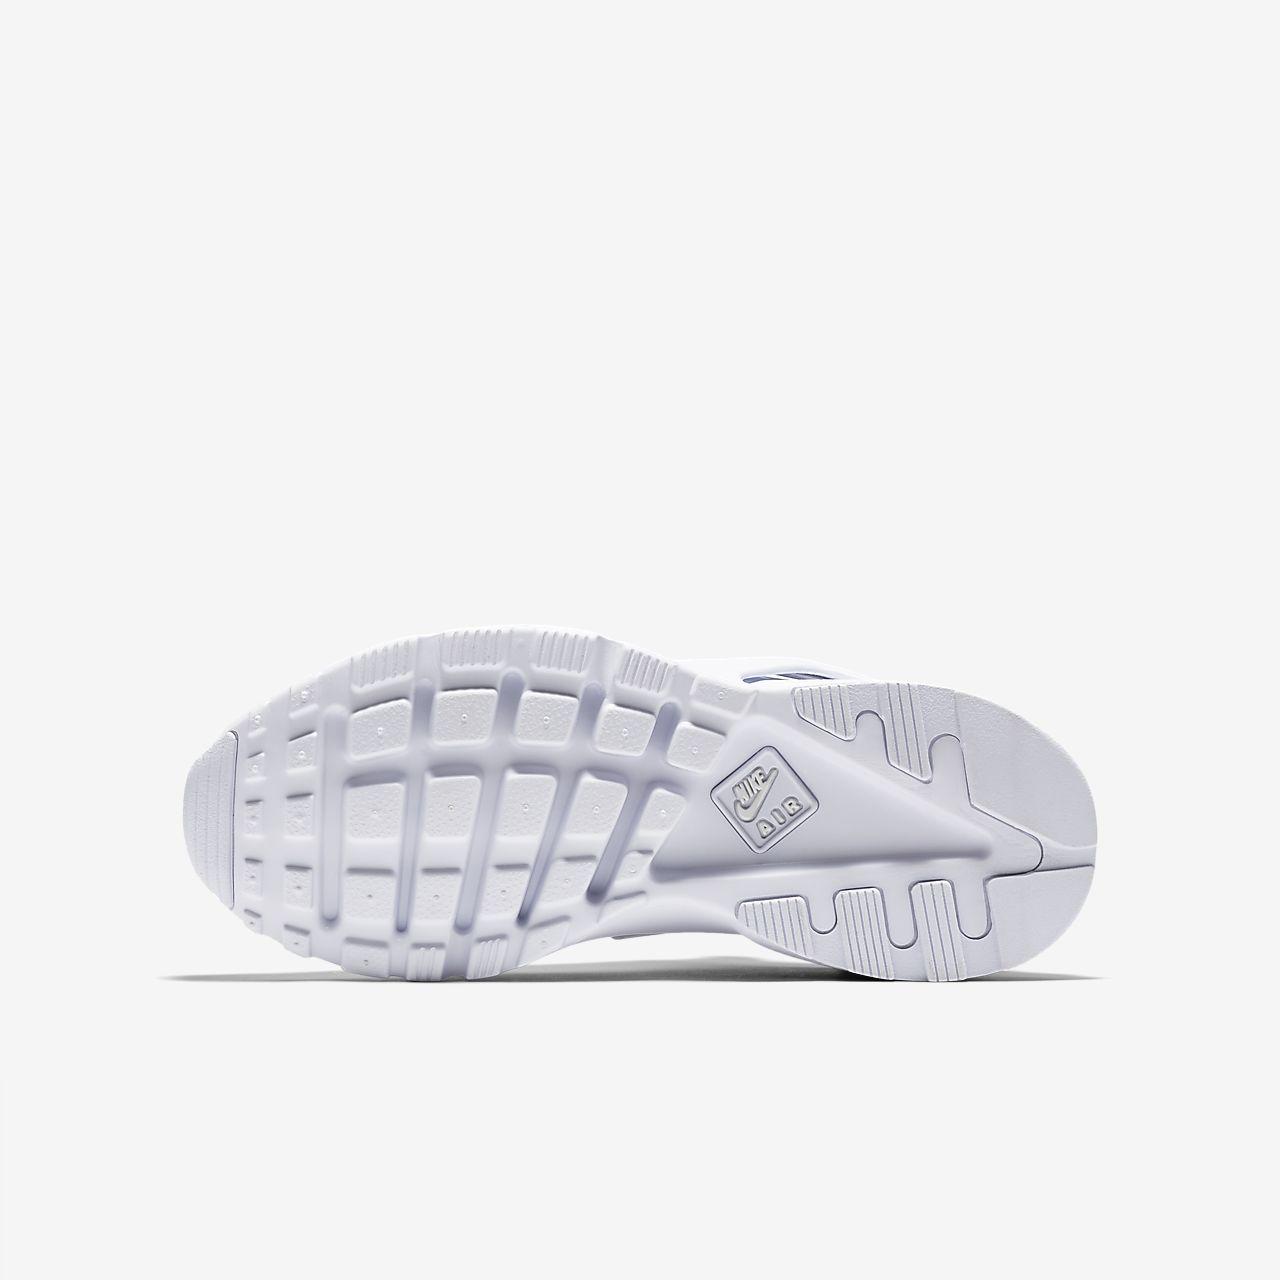 Sko Nike Air Huarache Ultra för ungdom